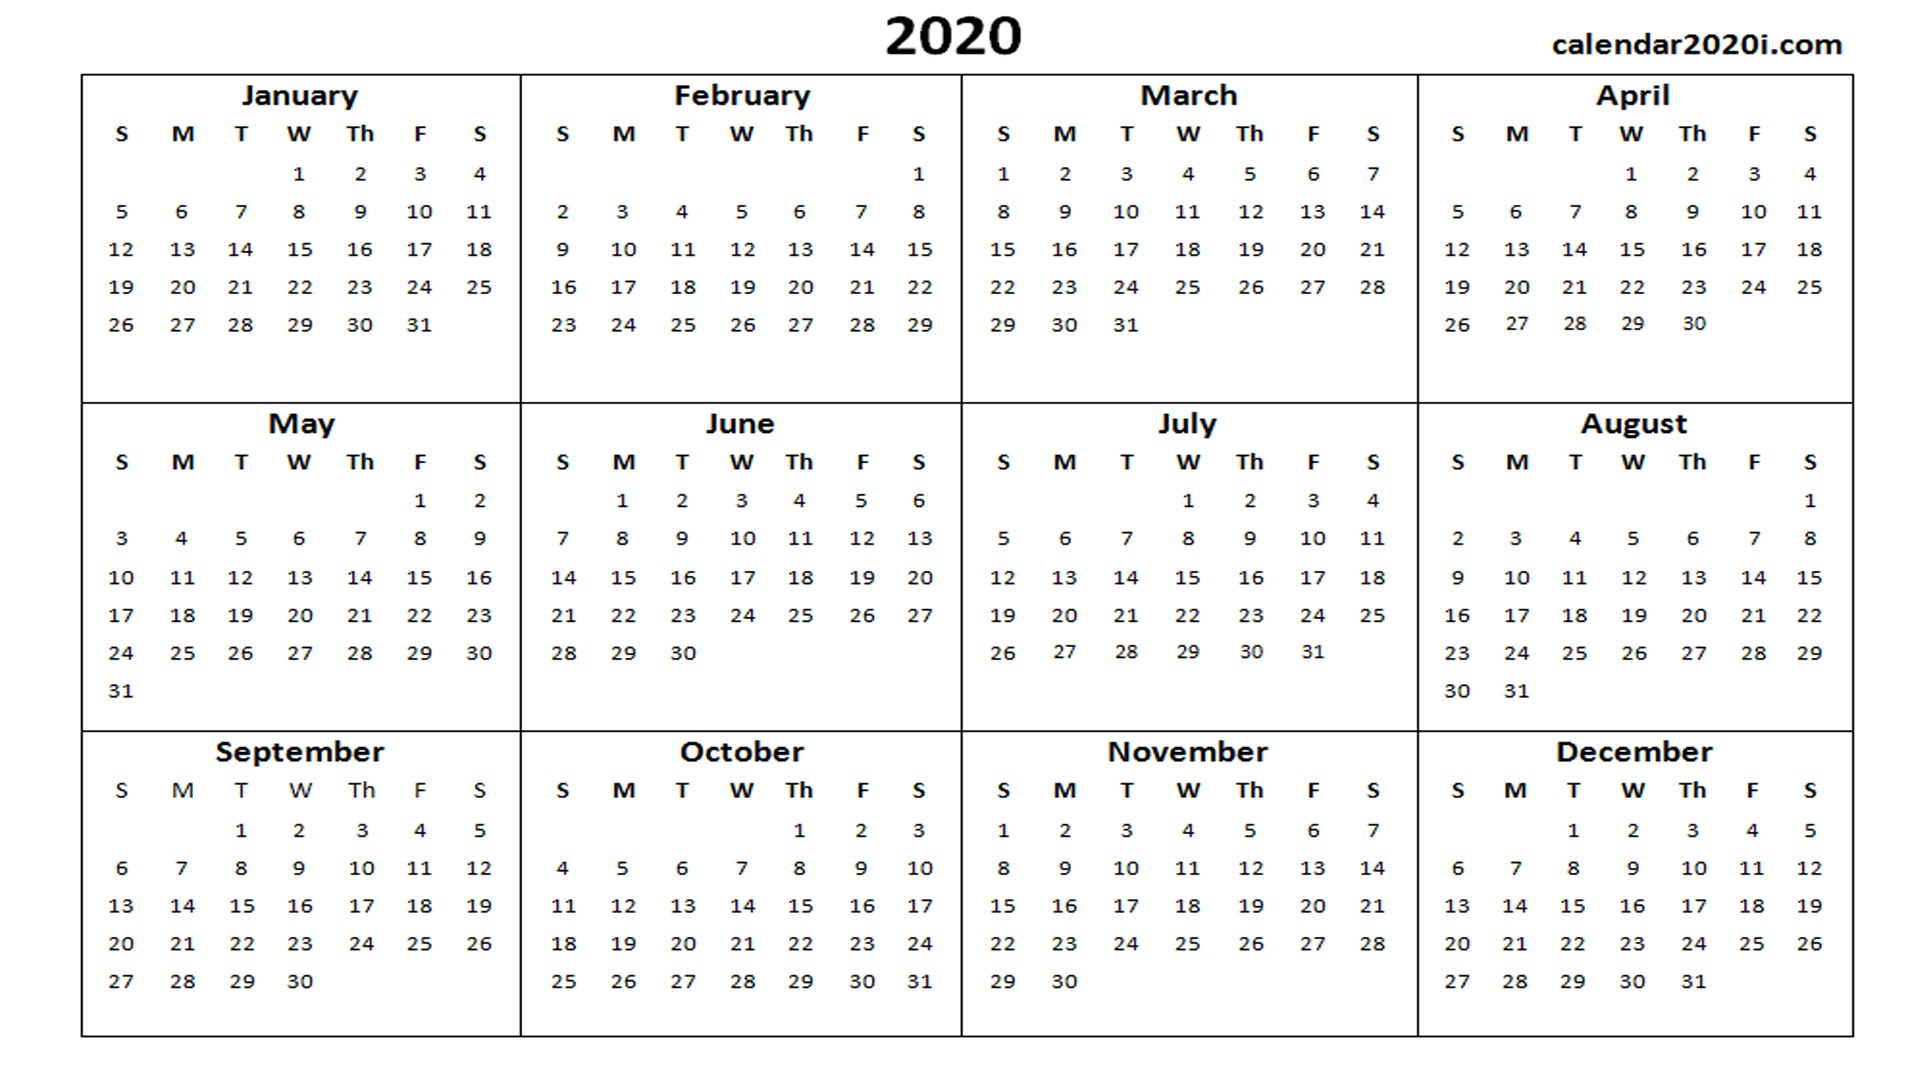 Printable Calendar for 2020